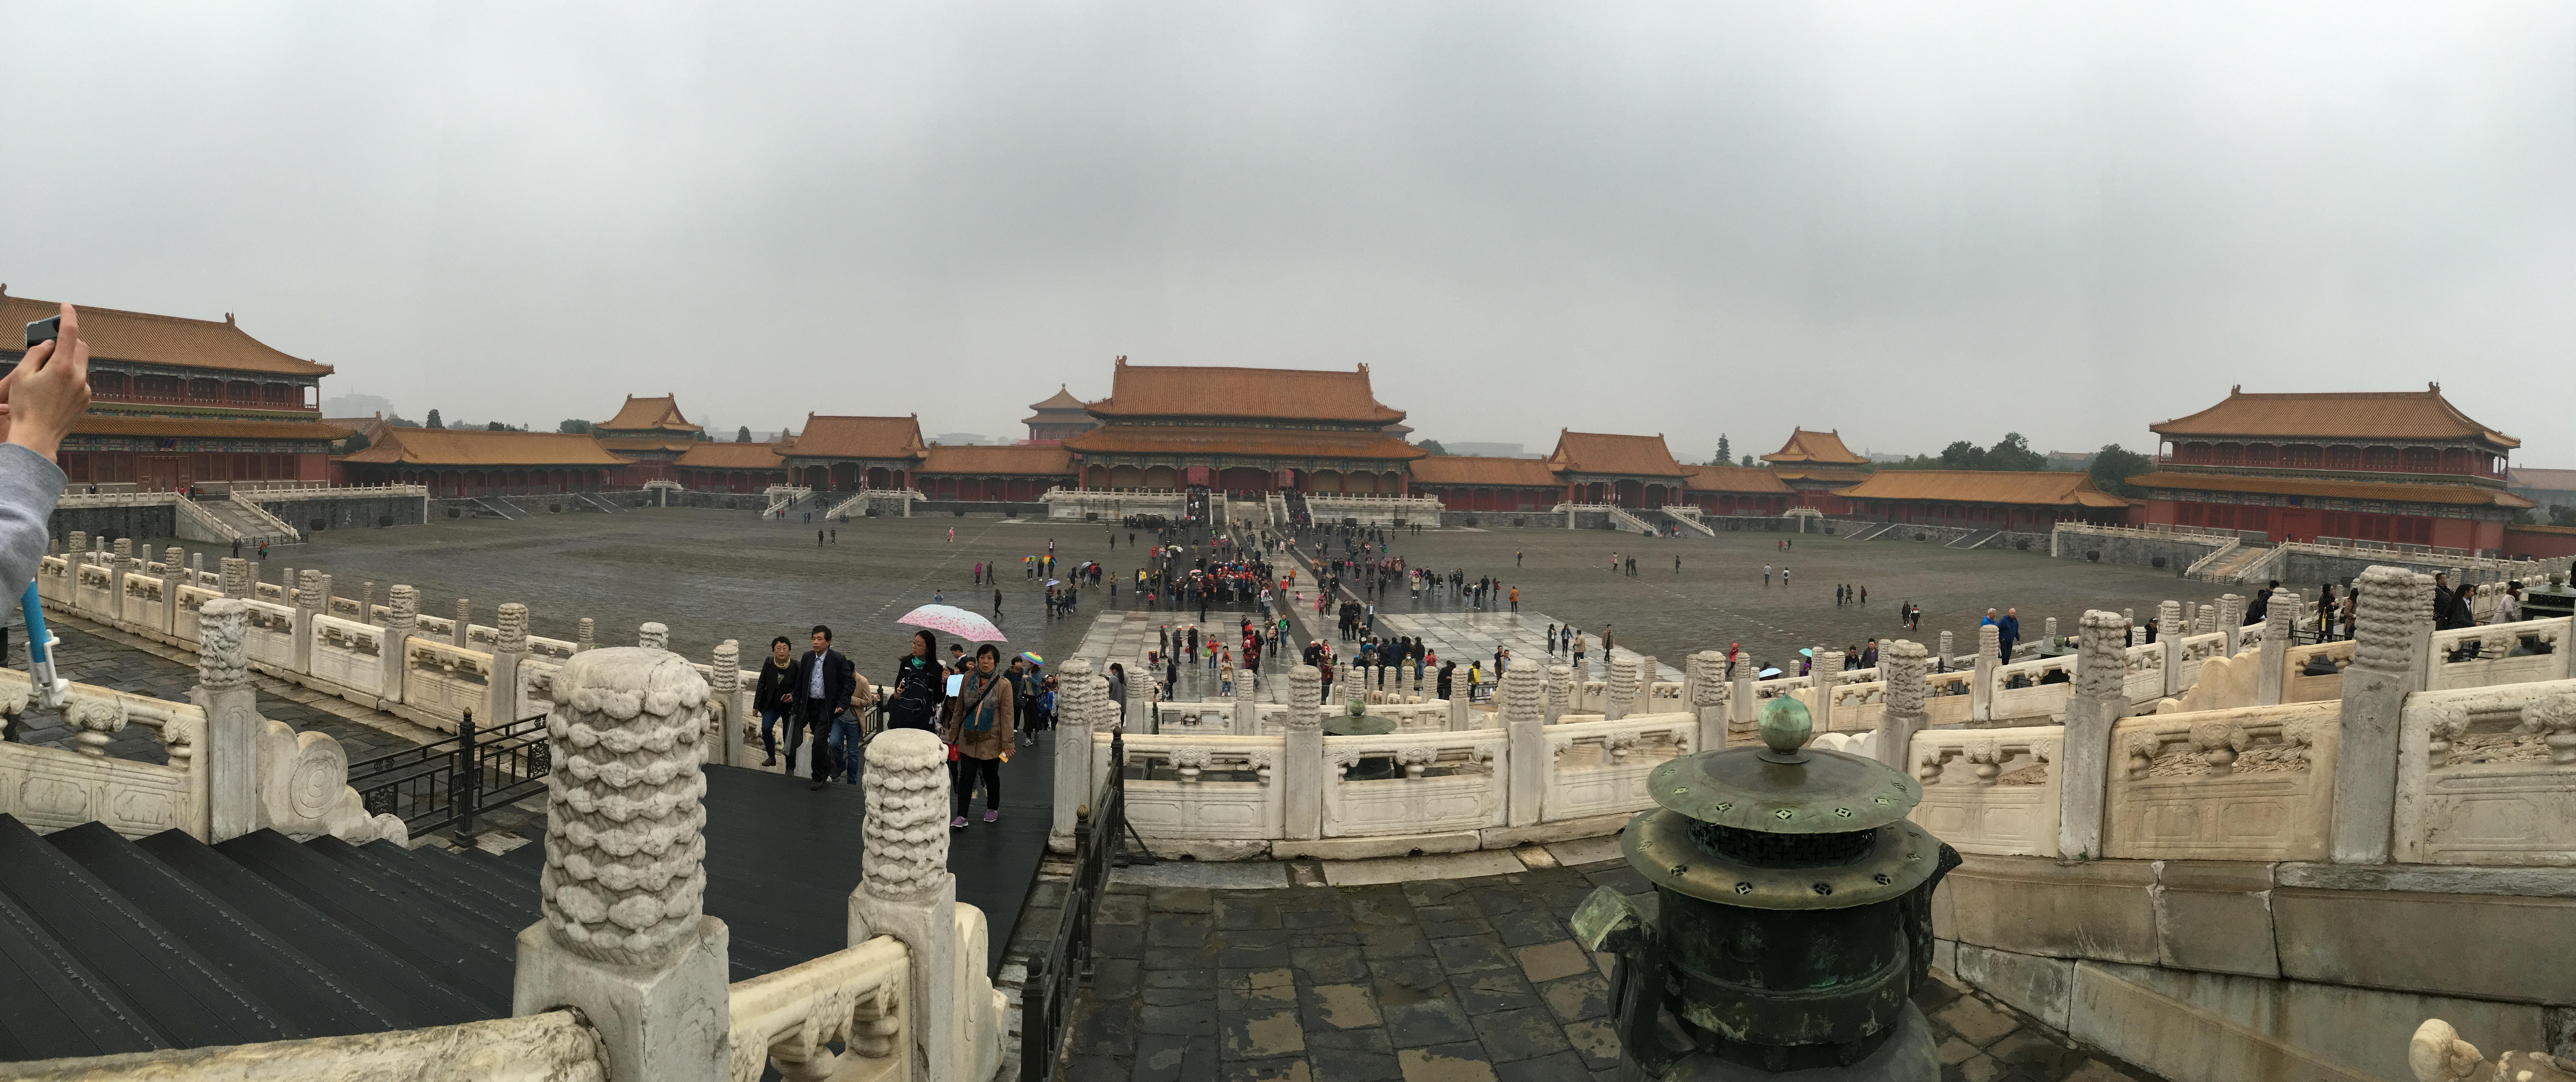 Verbotene Stadt_Peking